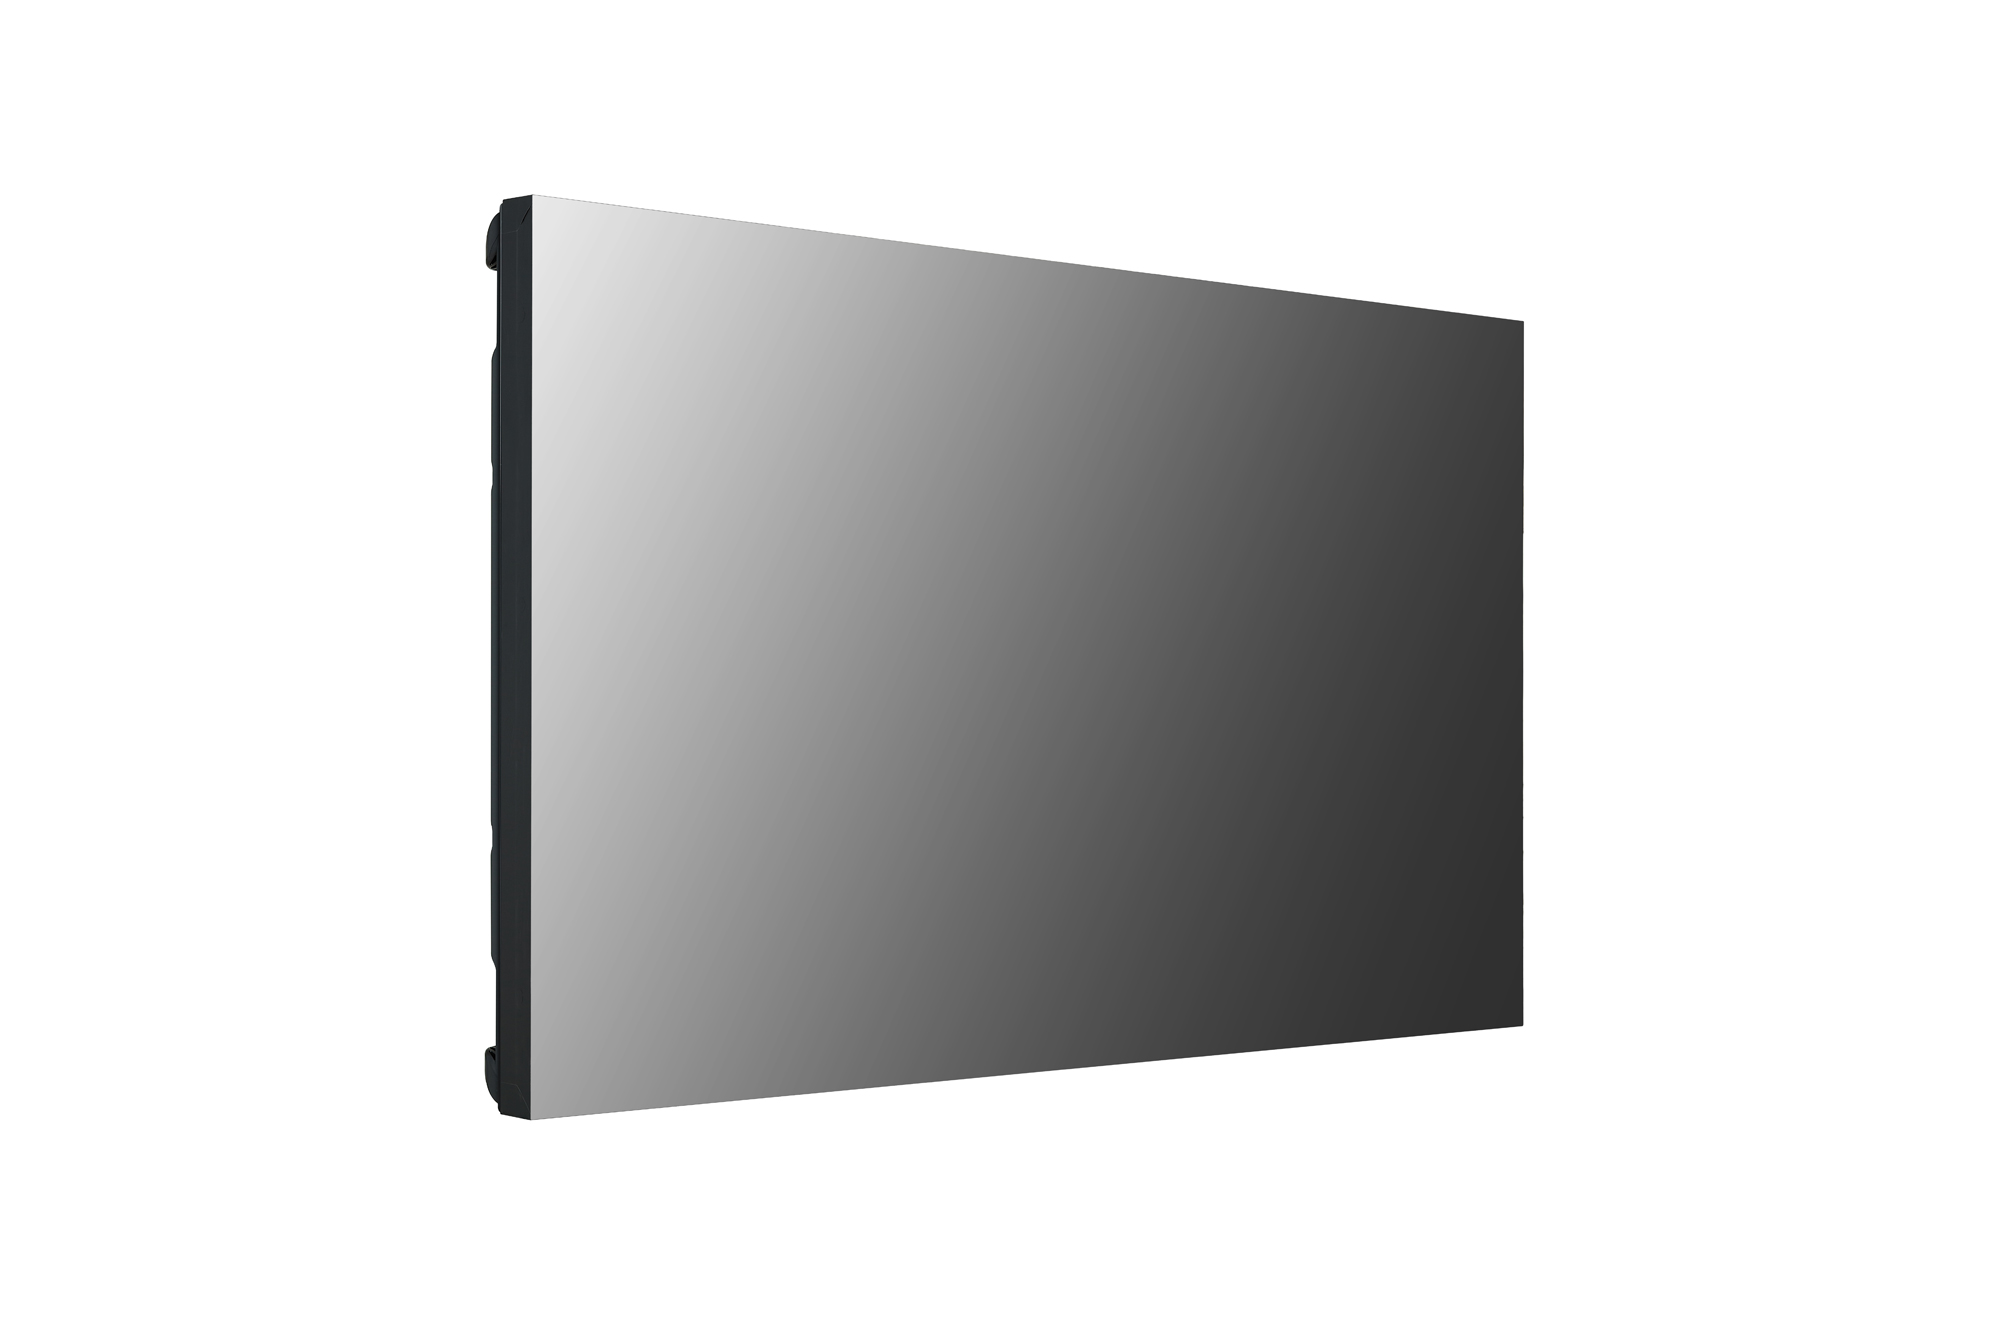 LG Video Wall 55SVH7PF-H 3